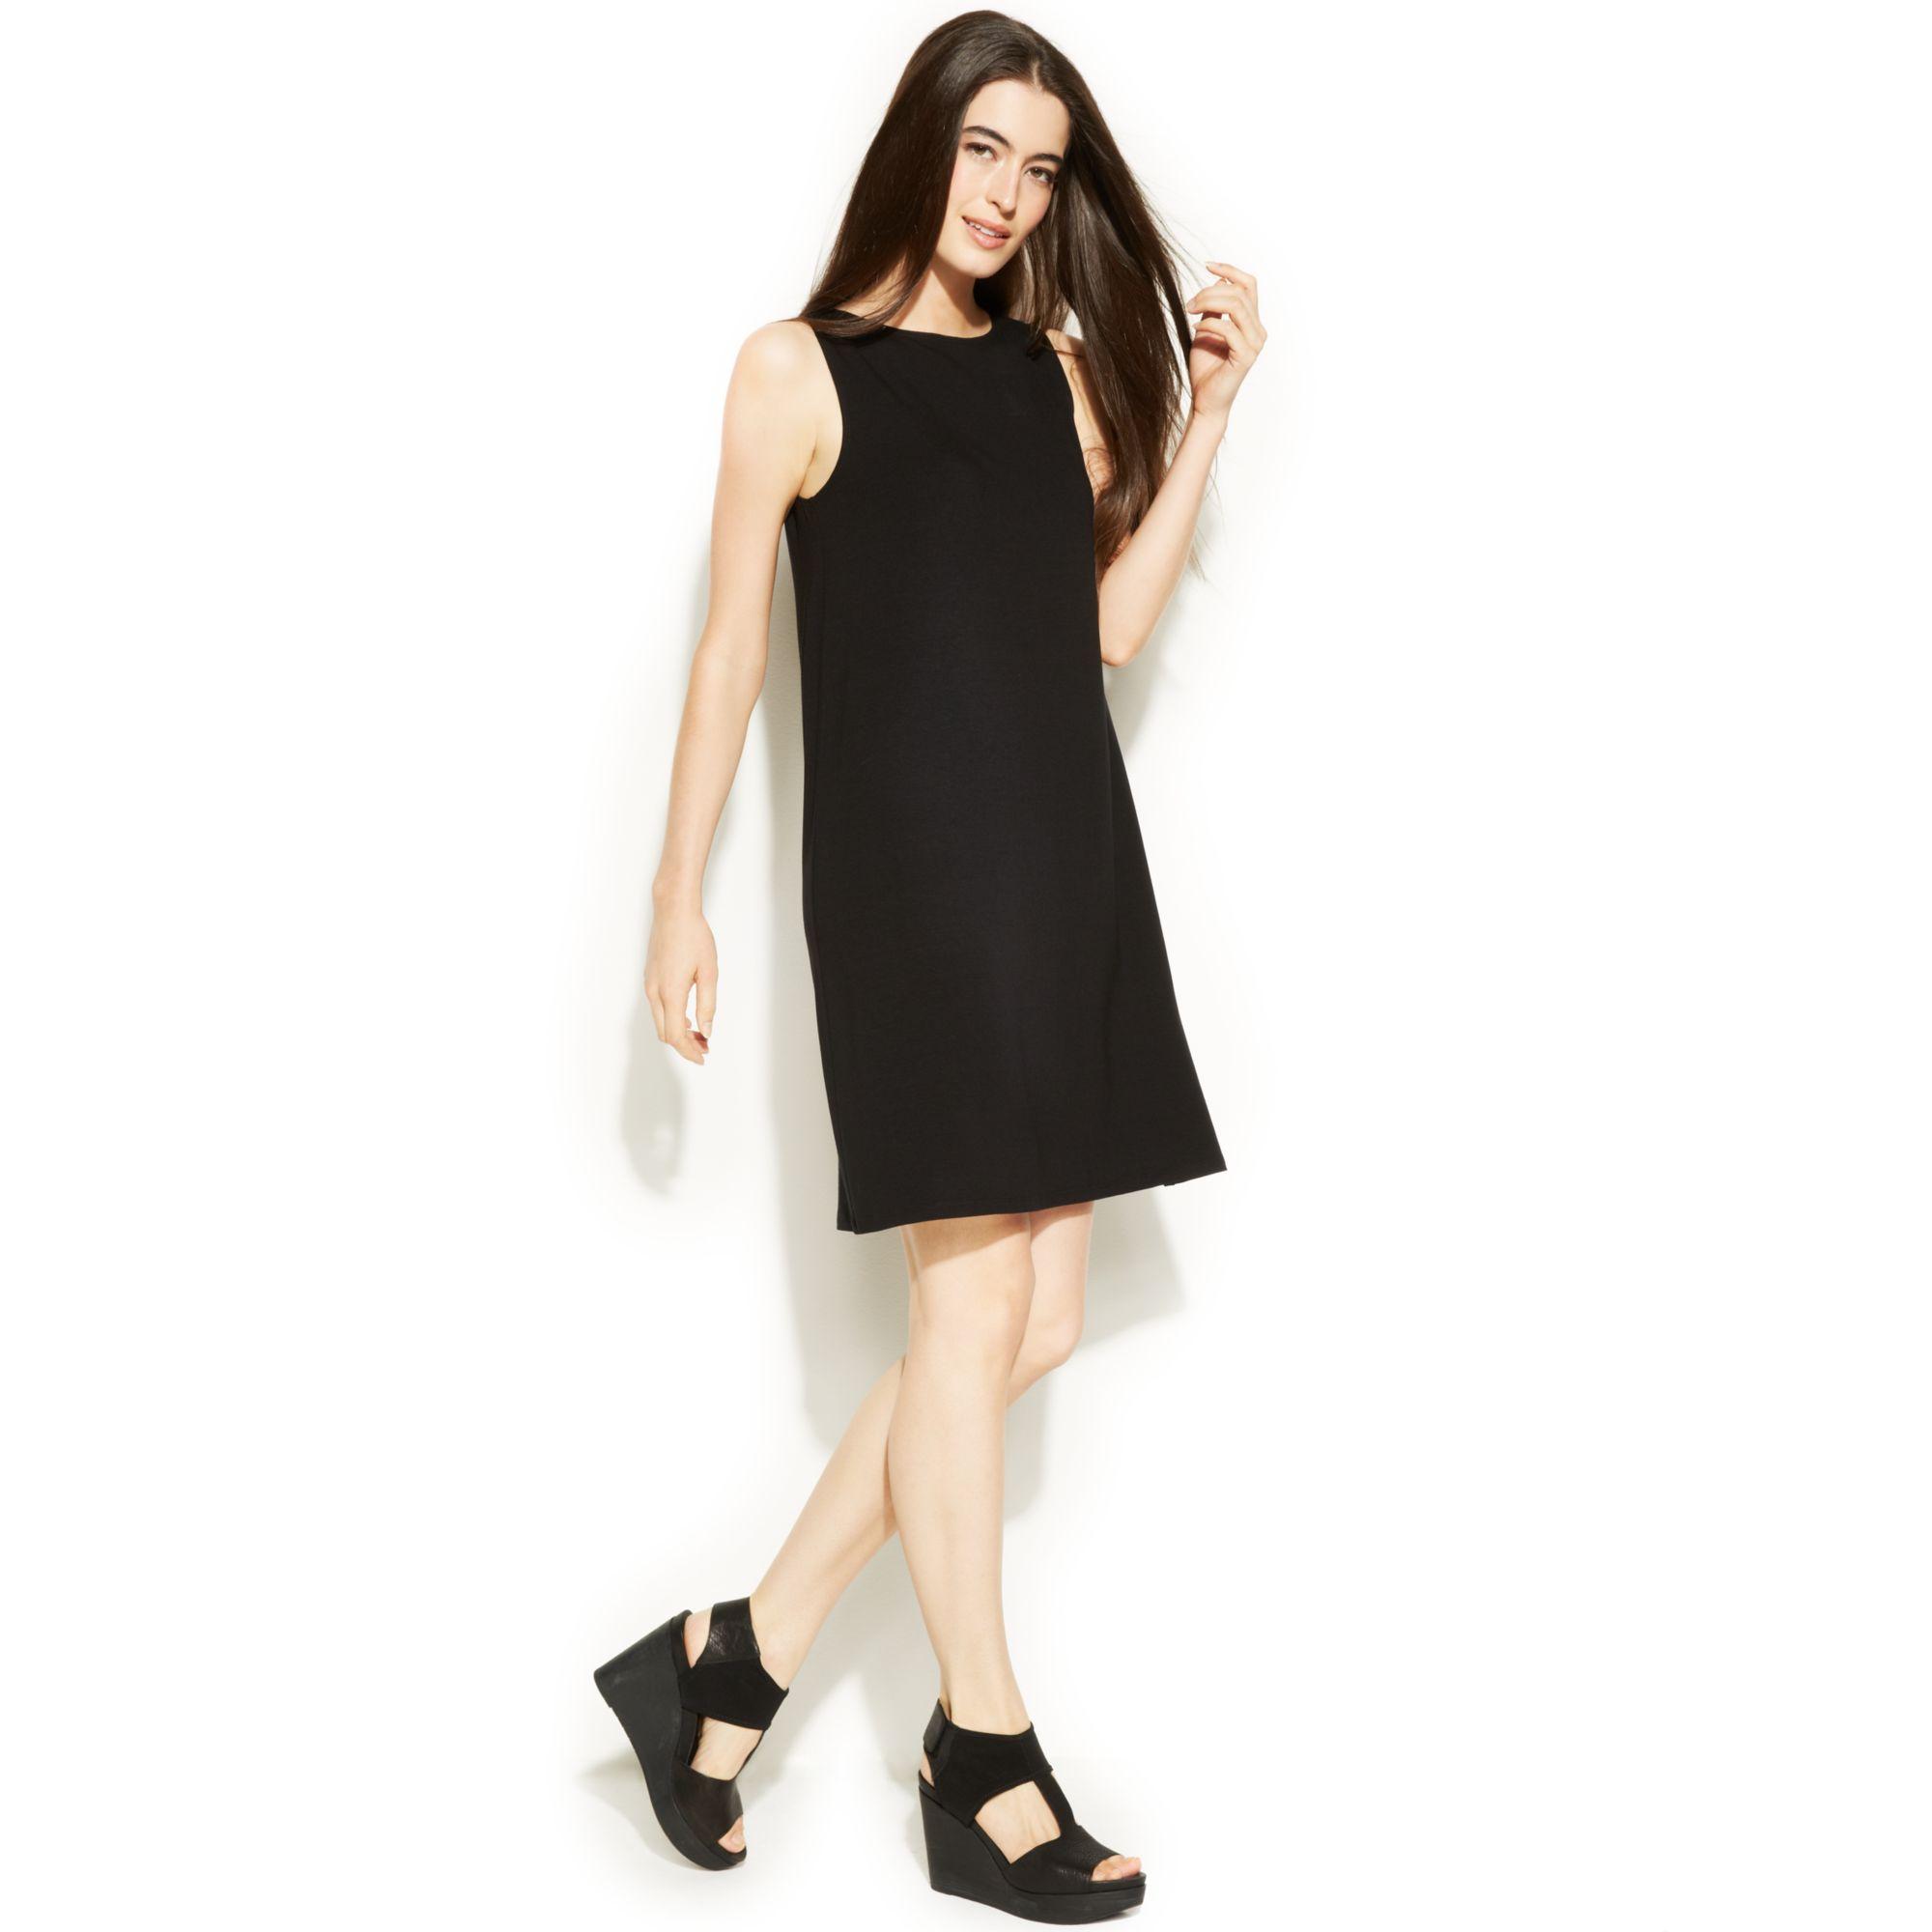 Eileen fisher Sleeveless Shift Dress in Black | Lyst